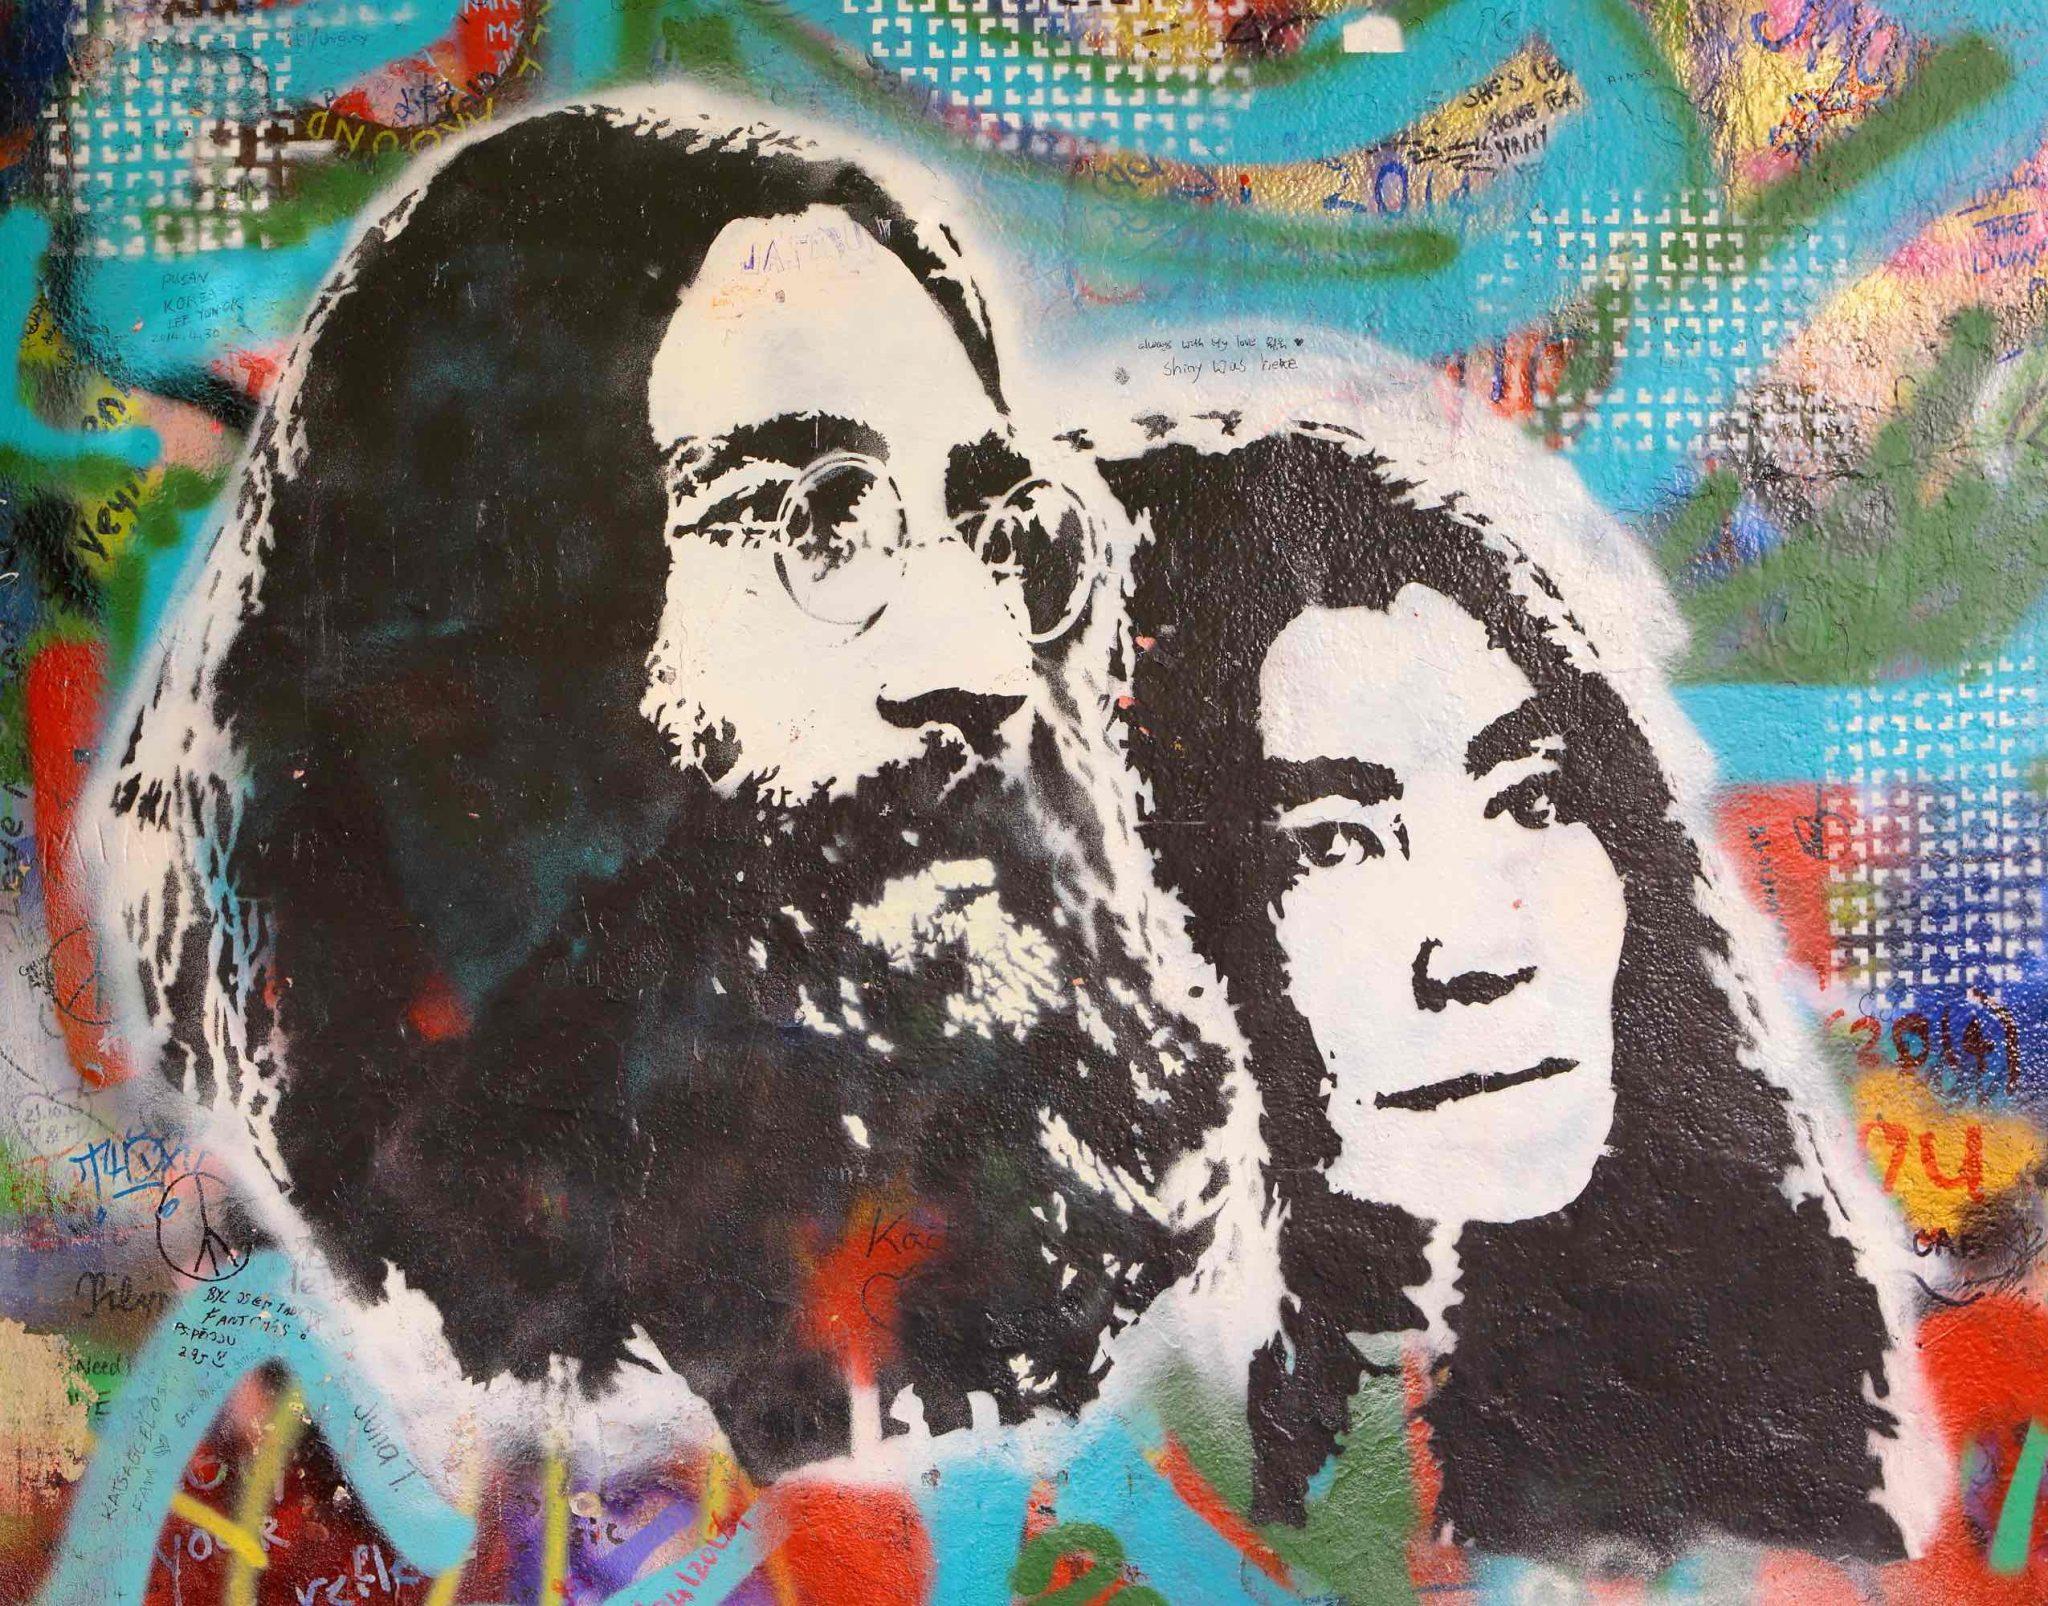 John Lennon had a long straggly beard in the 70's